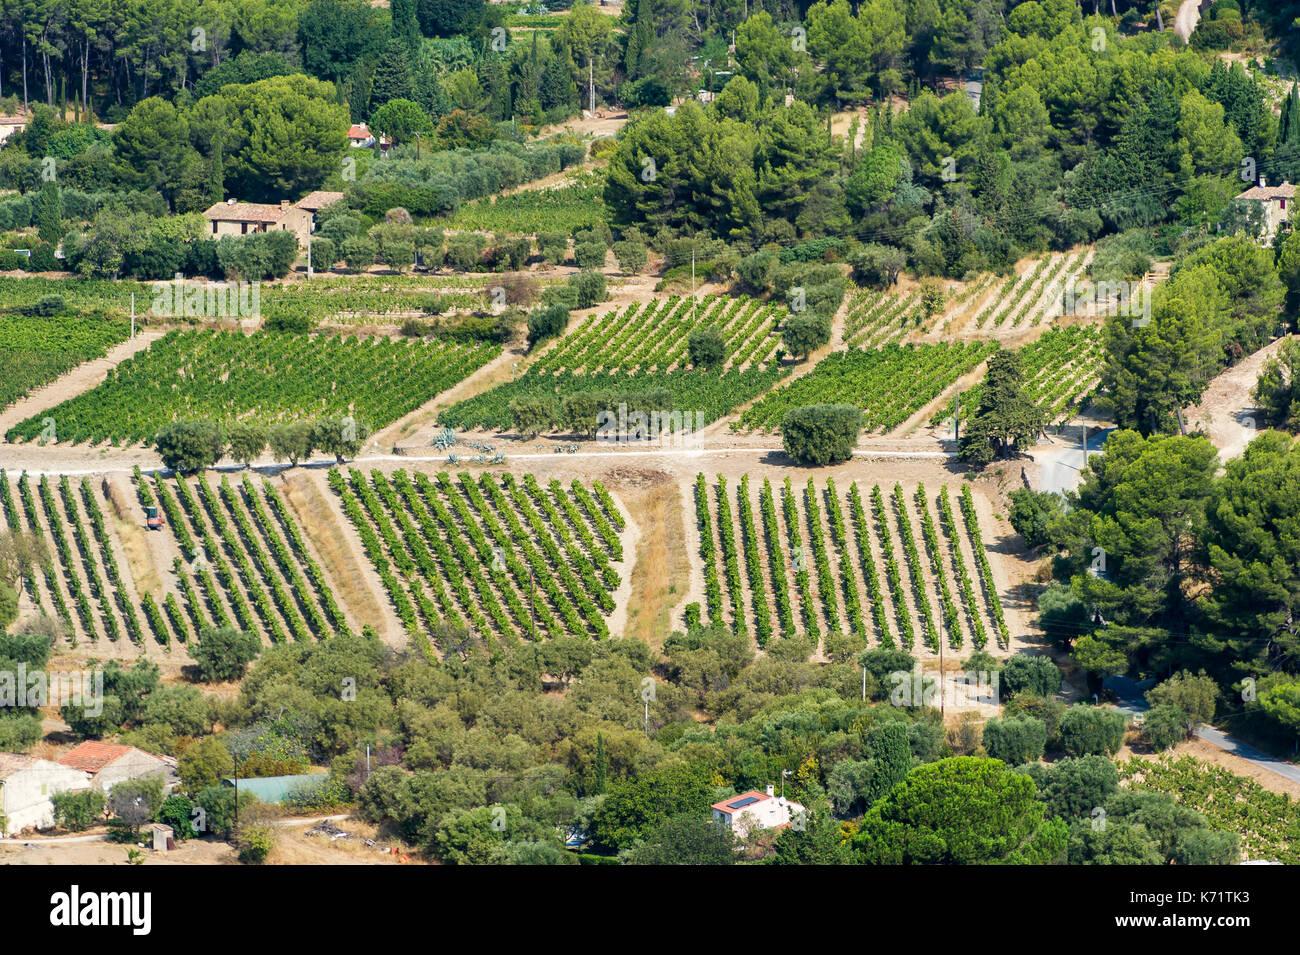 veraison de la vigne